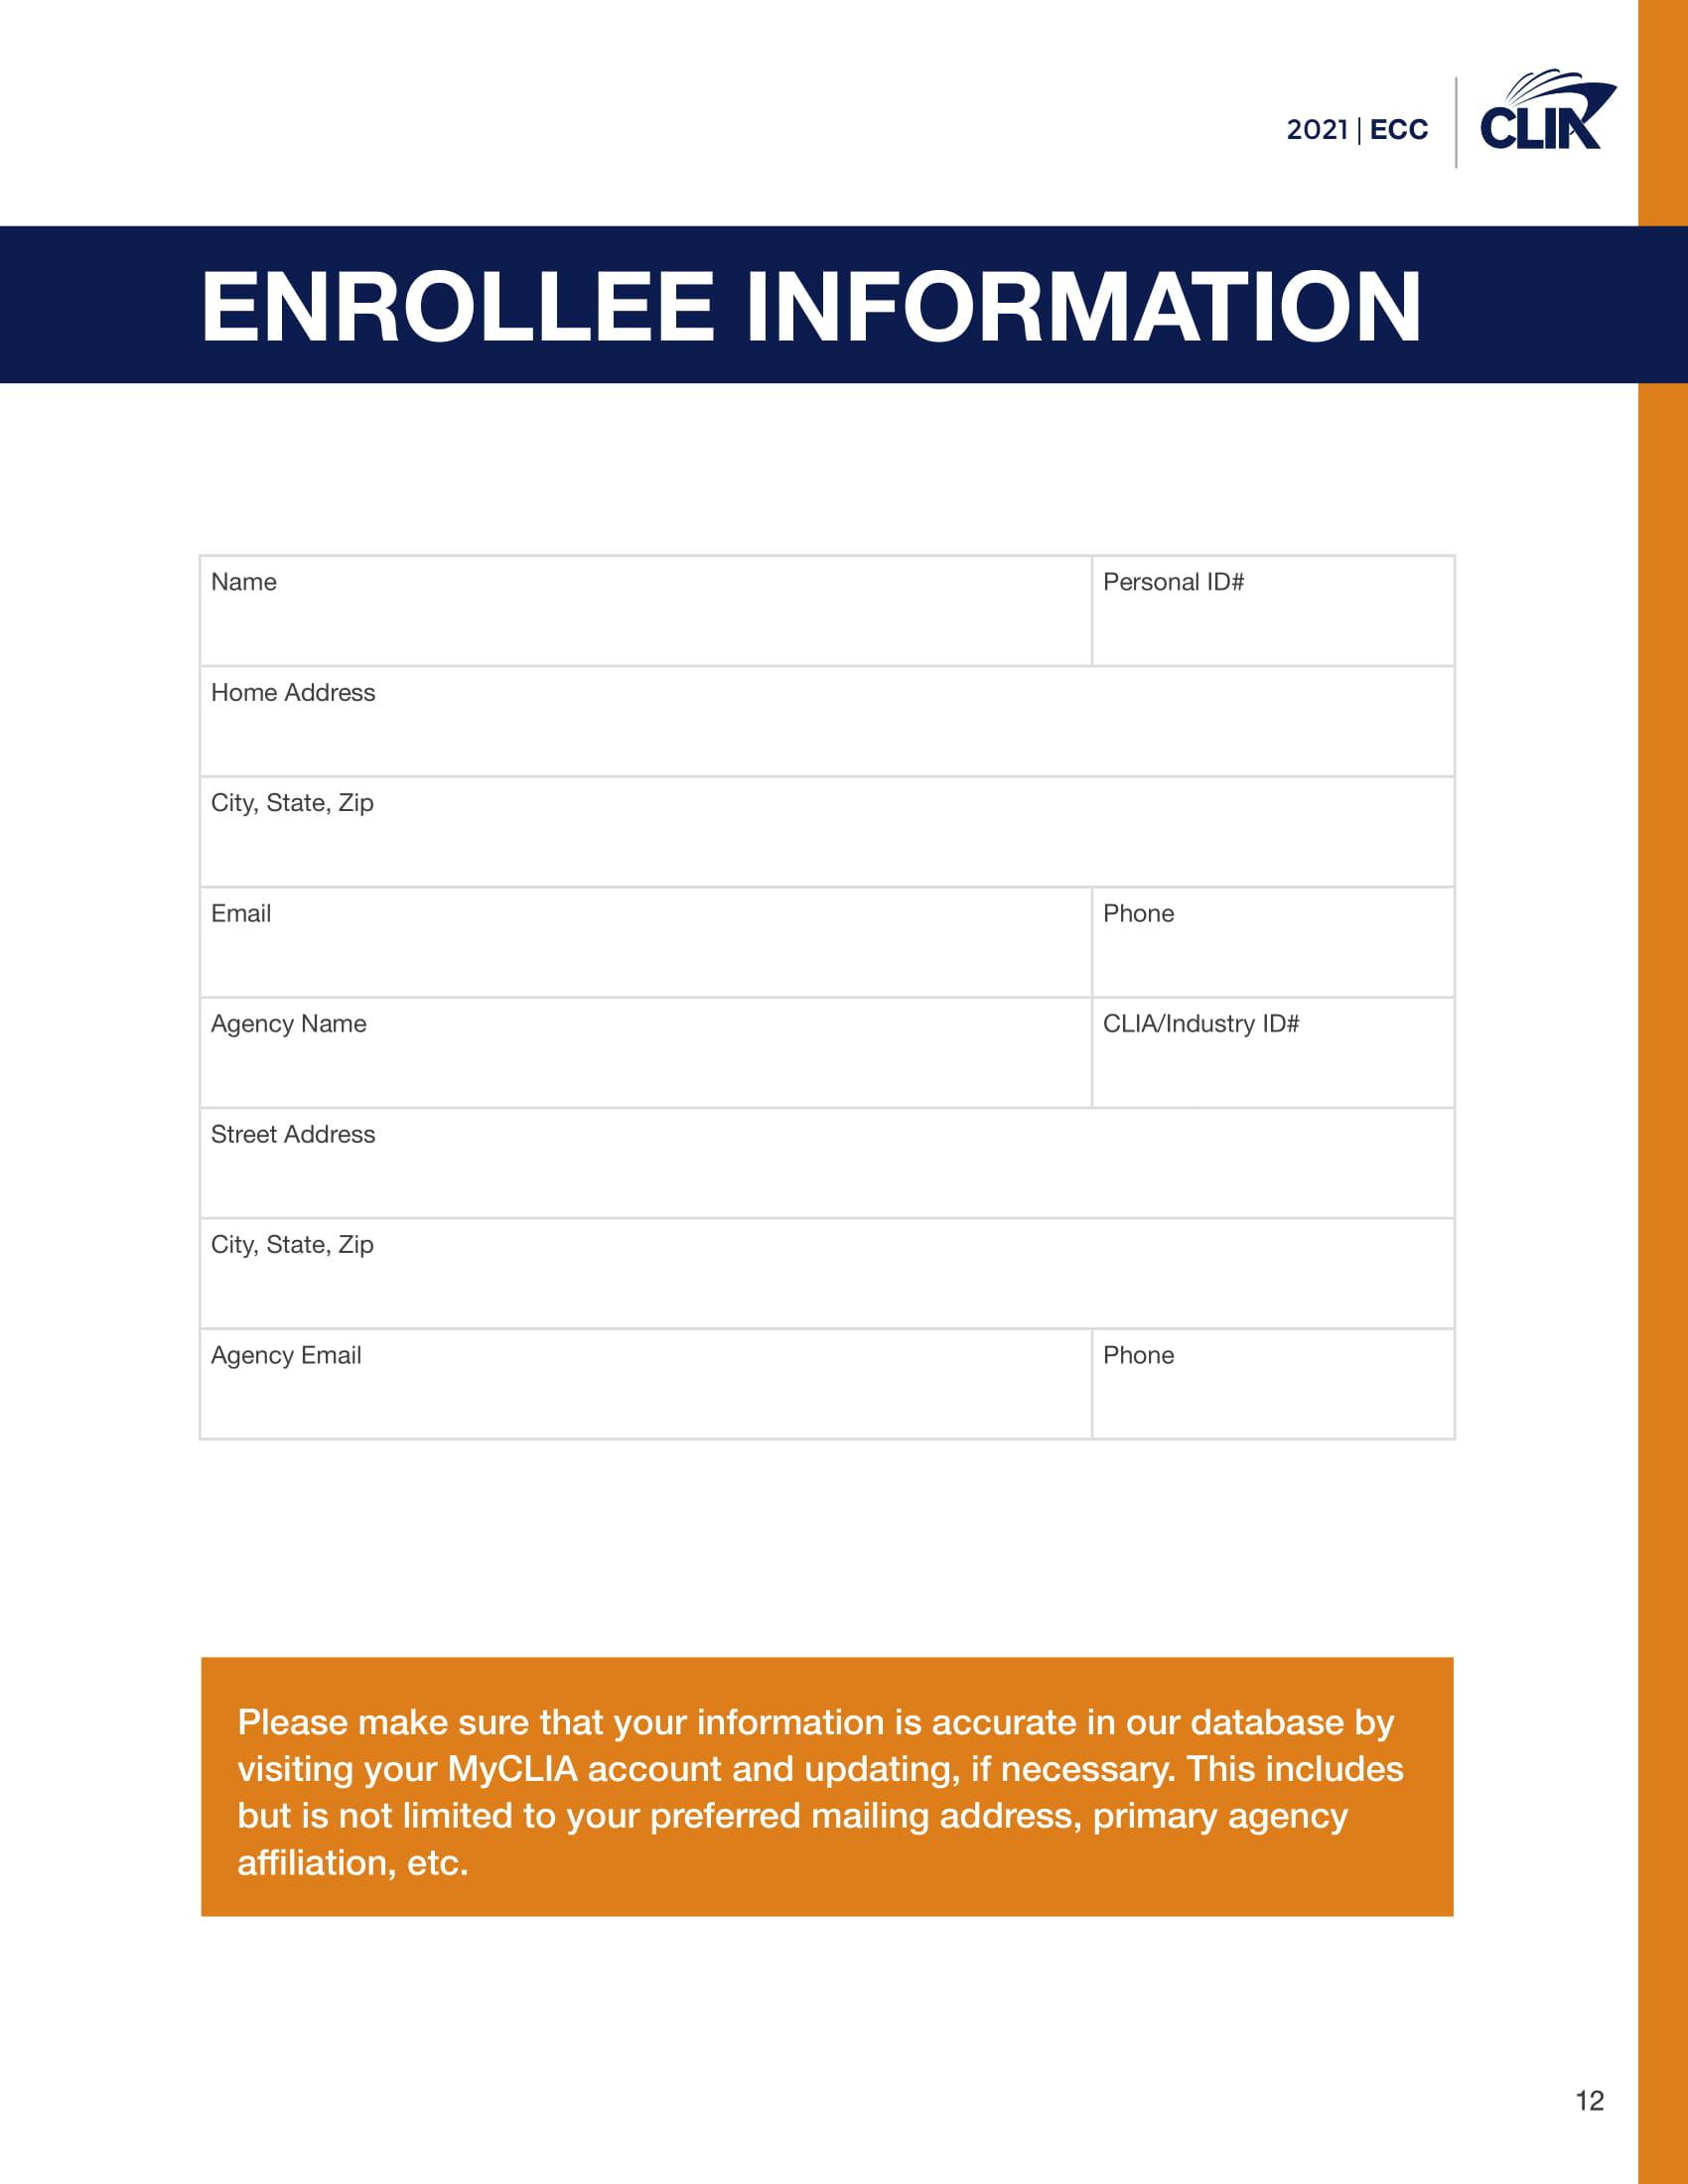 2021 Elite Cruise Counsellor Program - cliaecclogbook2021-1212020-12